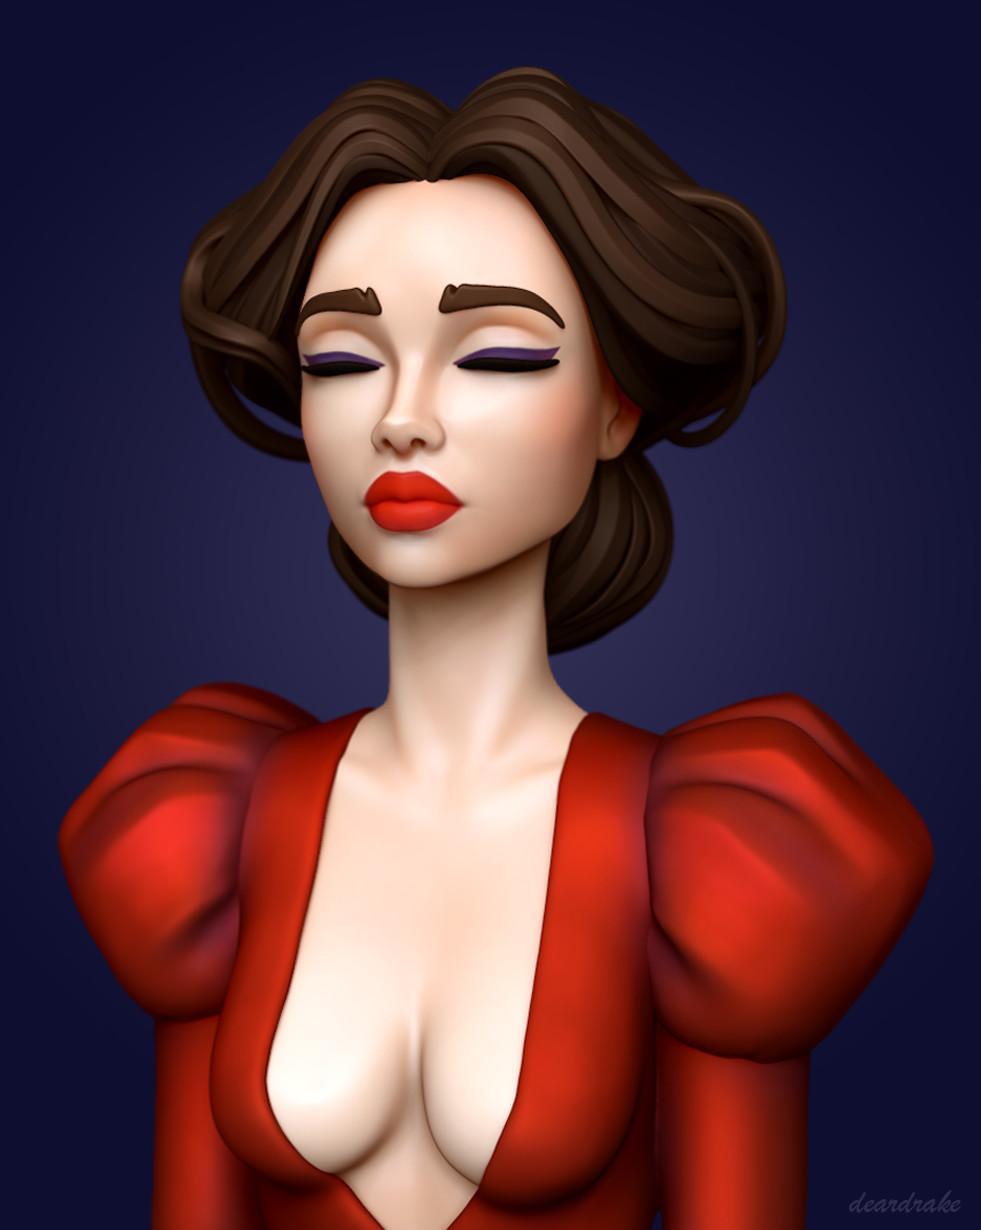 Zuzana bubenova redgirl main2